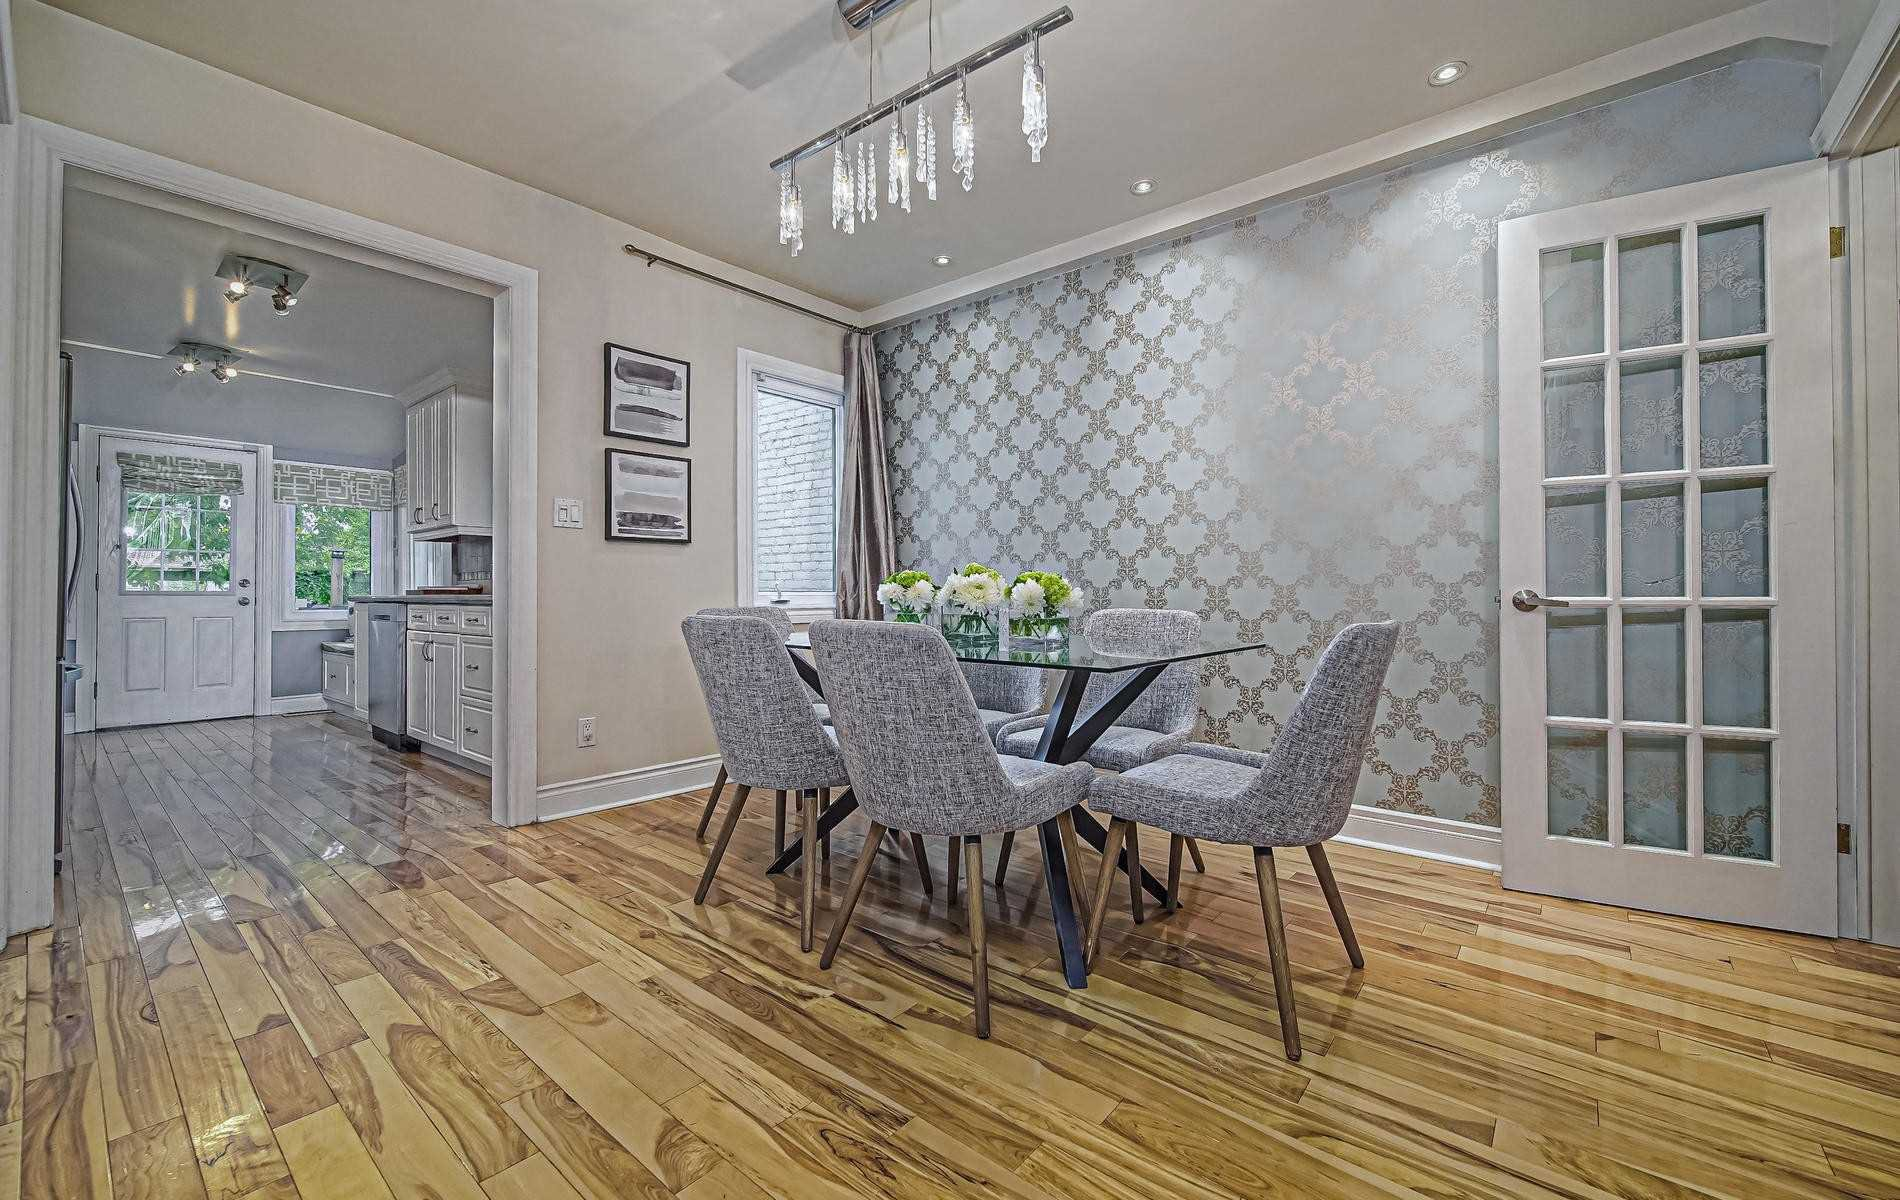 Photo 3: Photos: 84 Rushbrooke Avenue in Toronto: South Riverdale House (2-Storey) for sale (Toronto E01)  : MLS®# E4600791